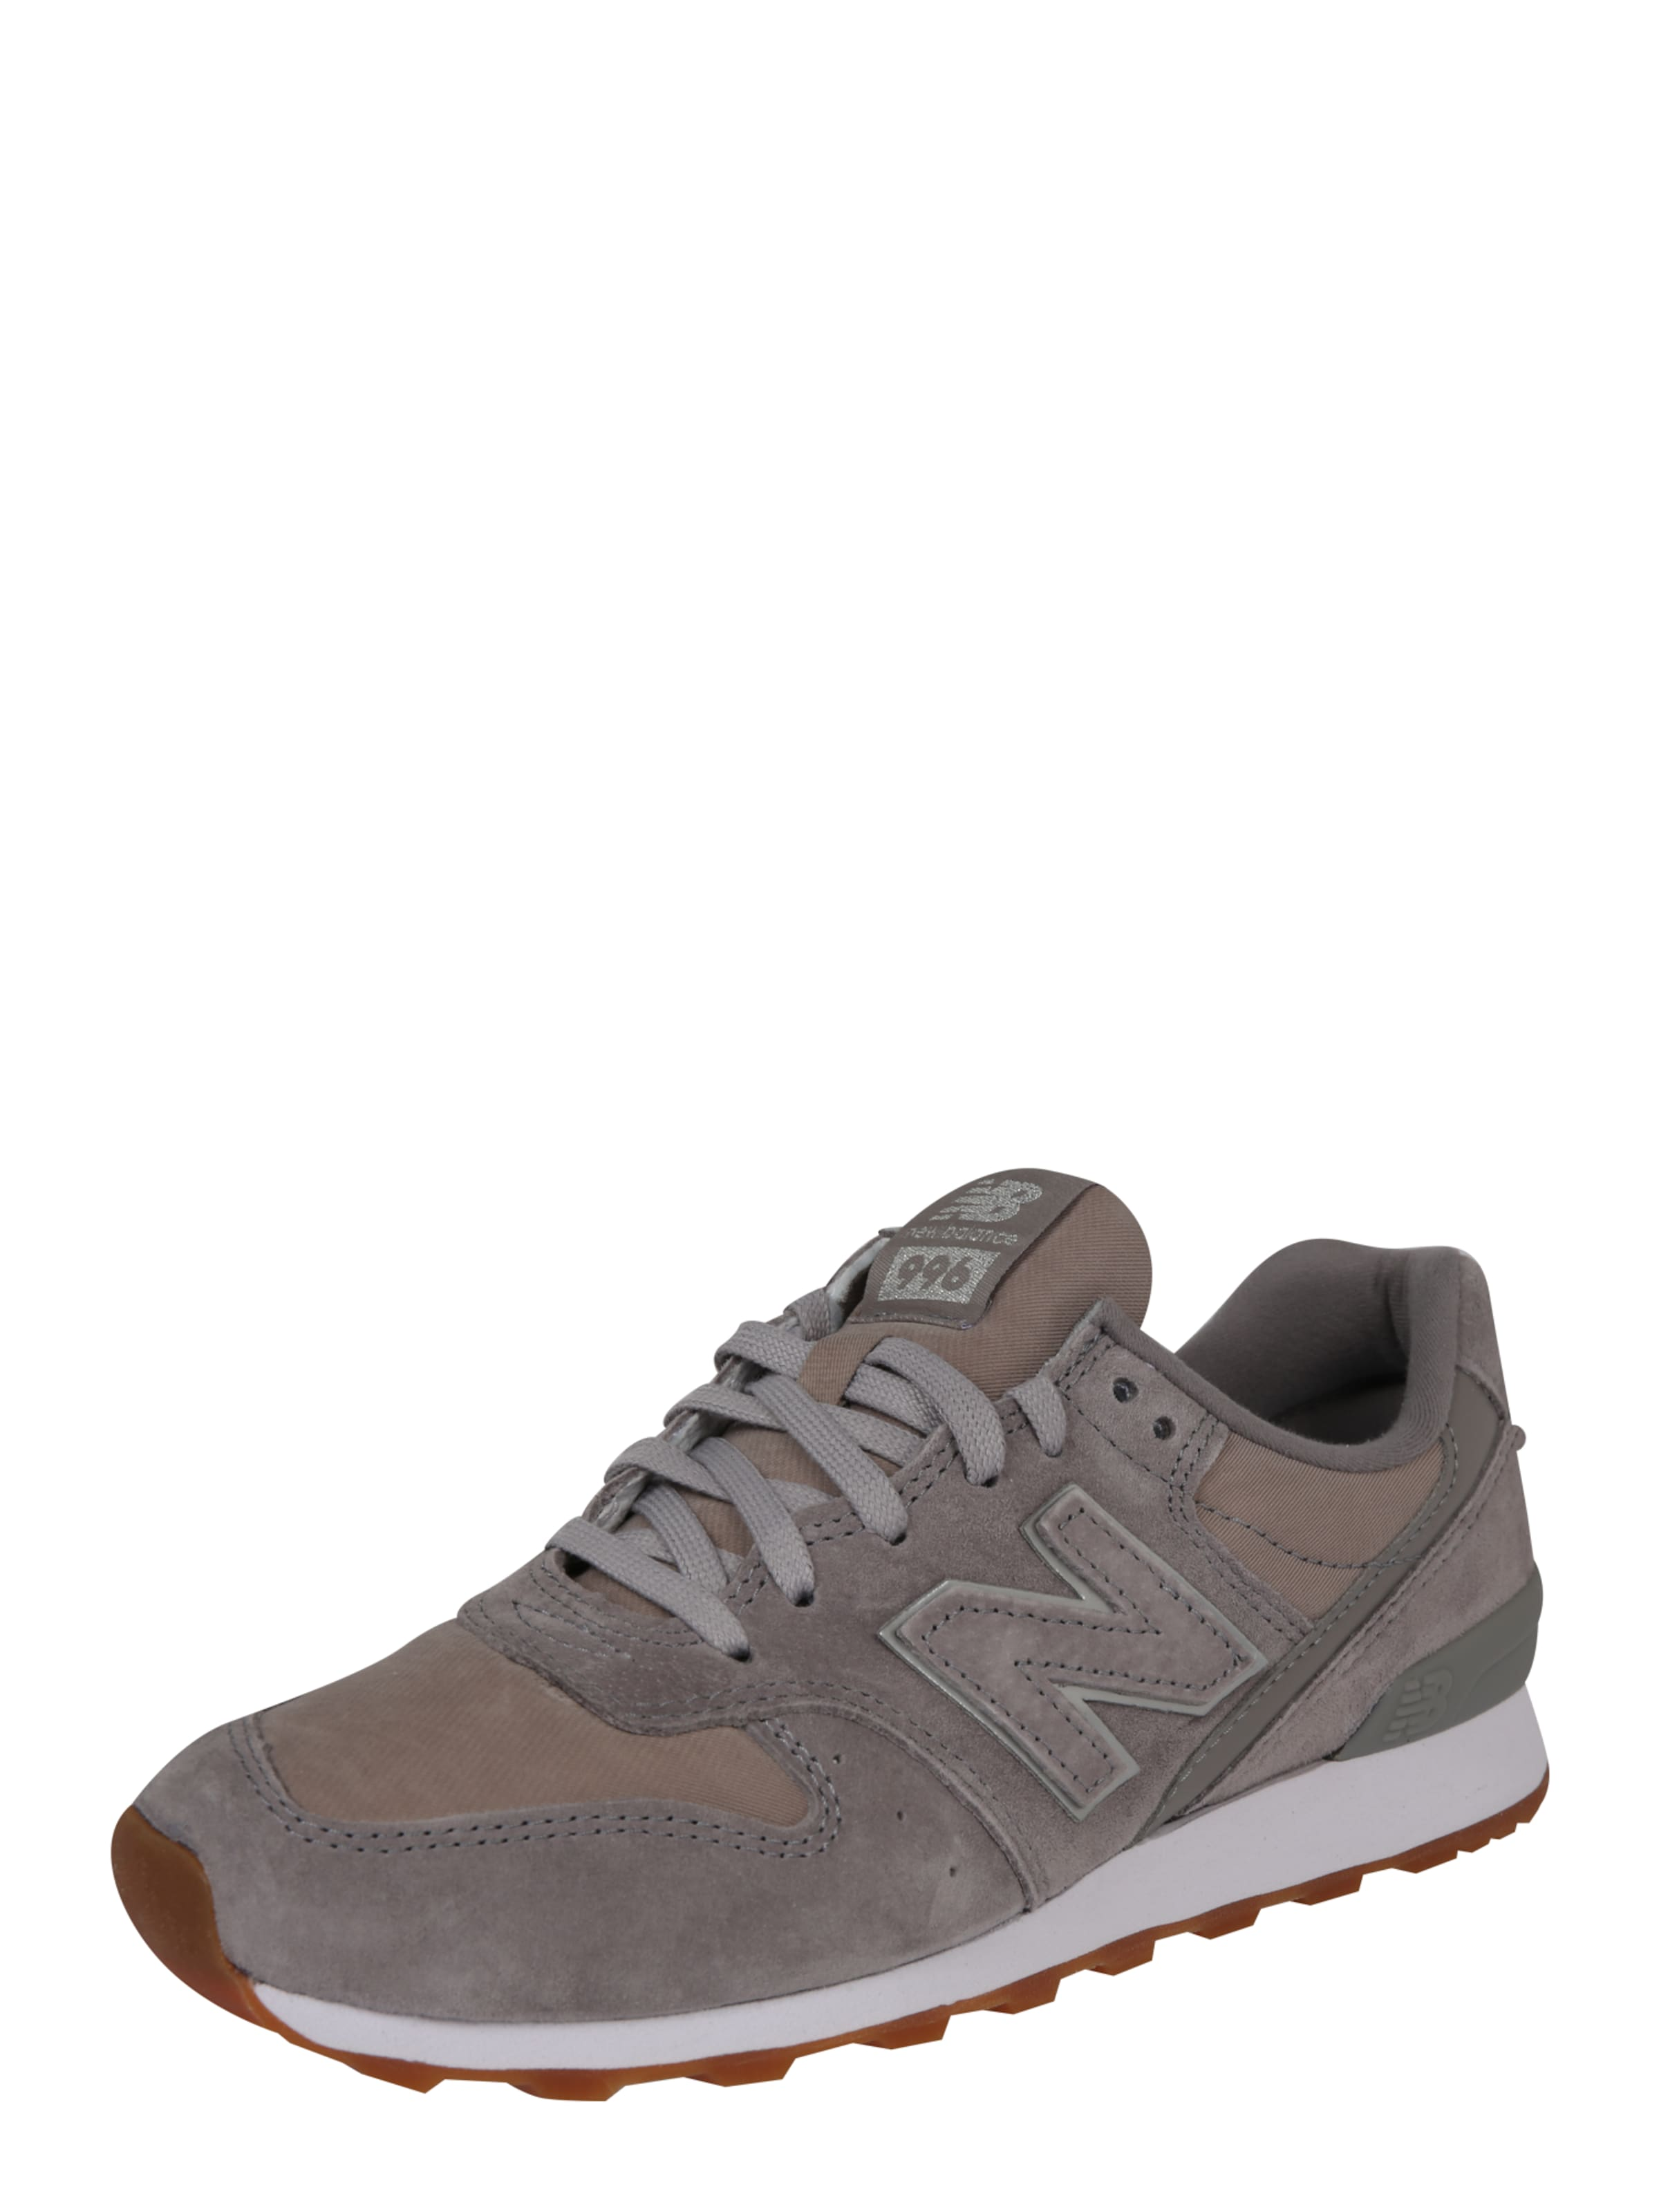 In New 'wr996' Balance Sneaker BeigeOffwhite UMLVpGqzS